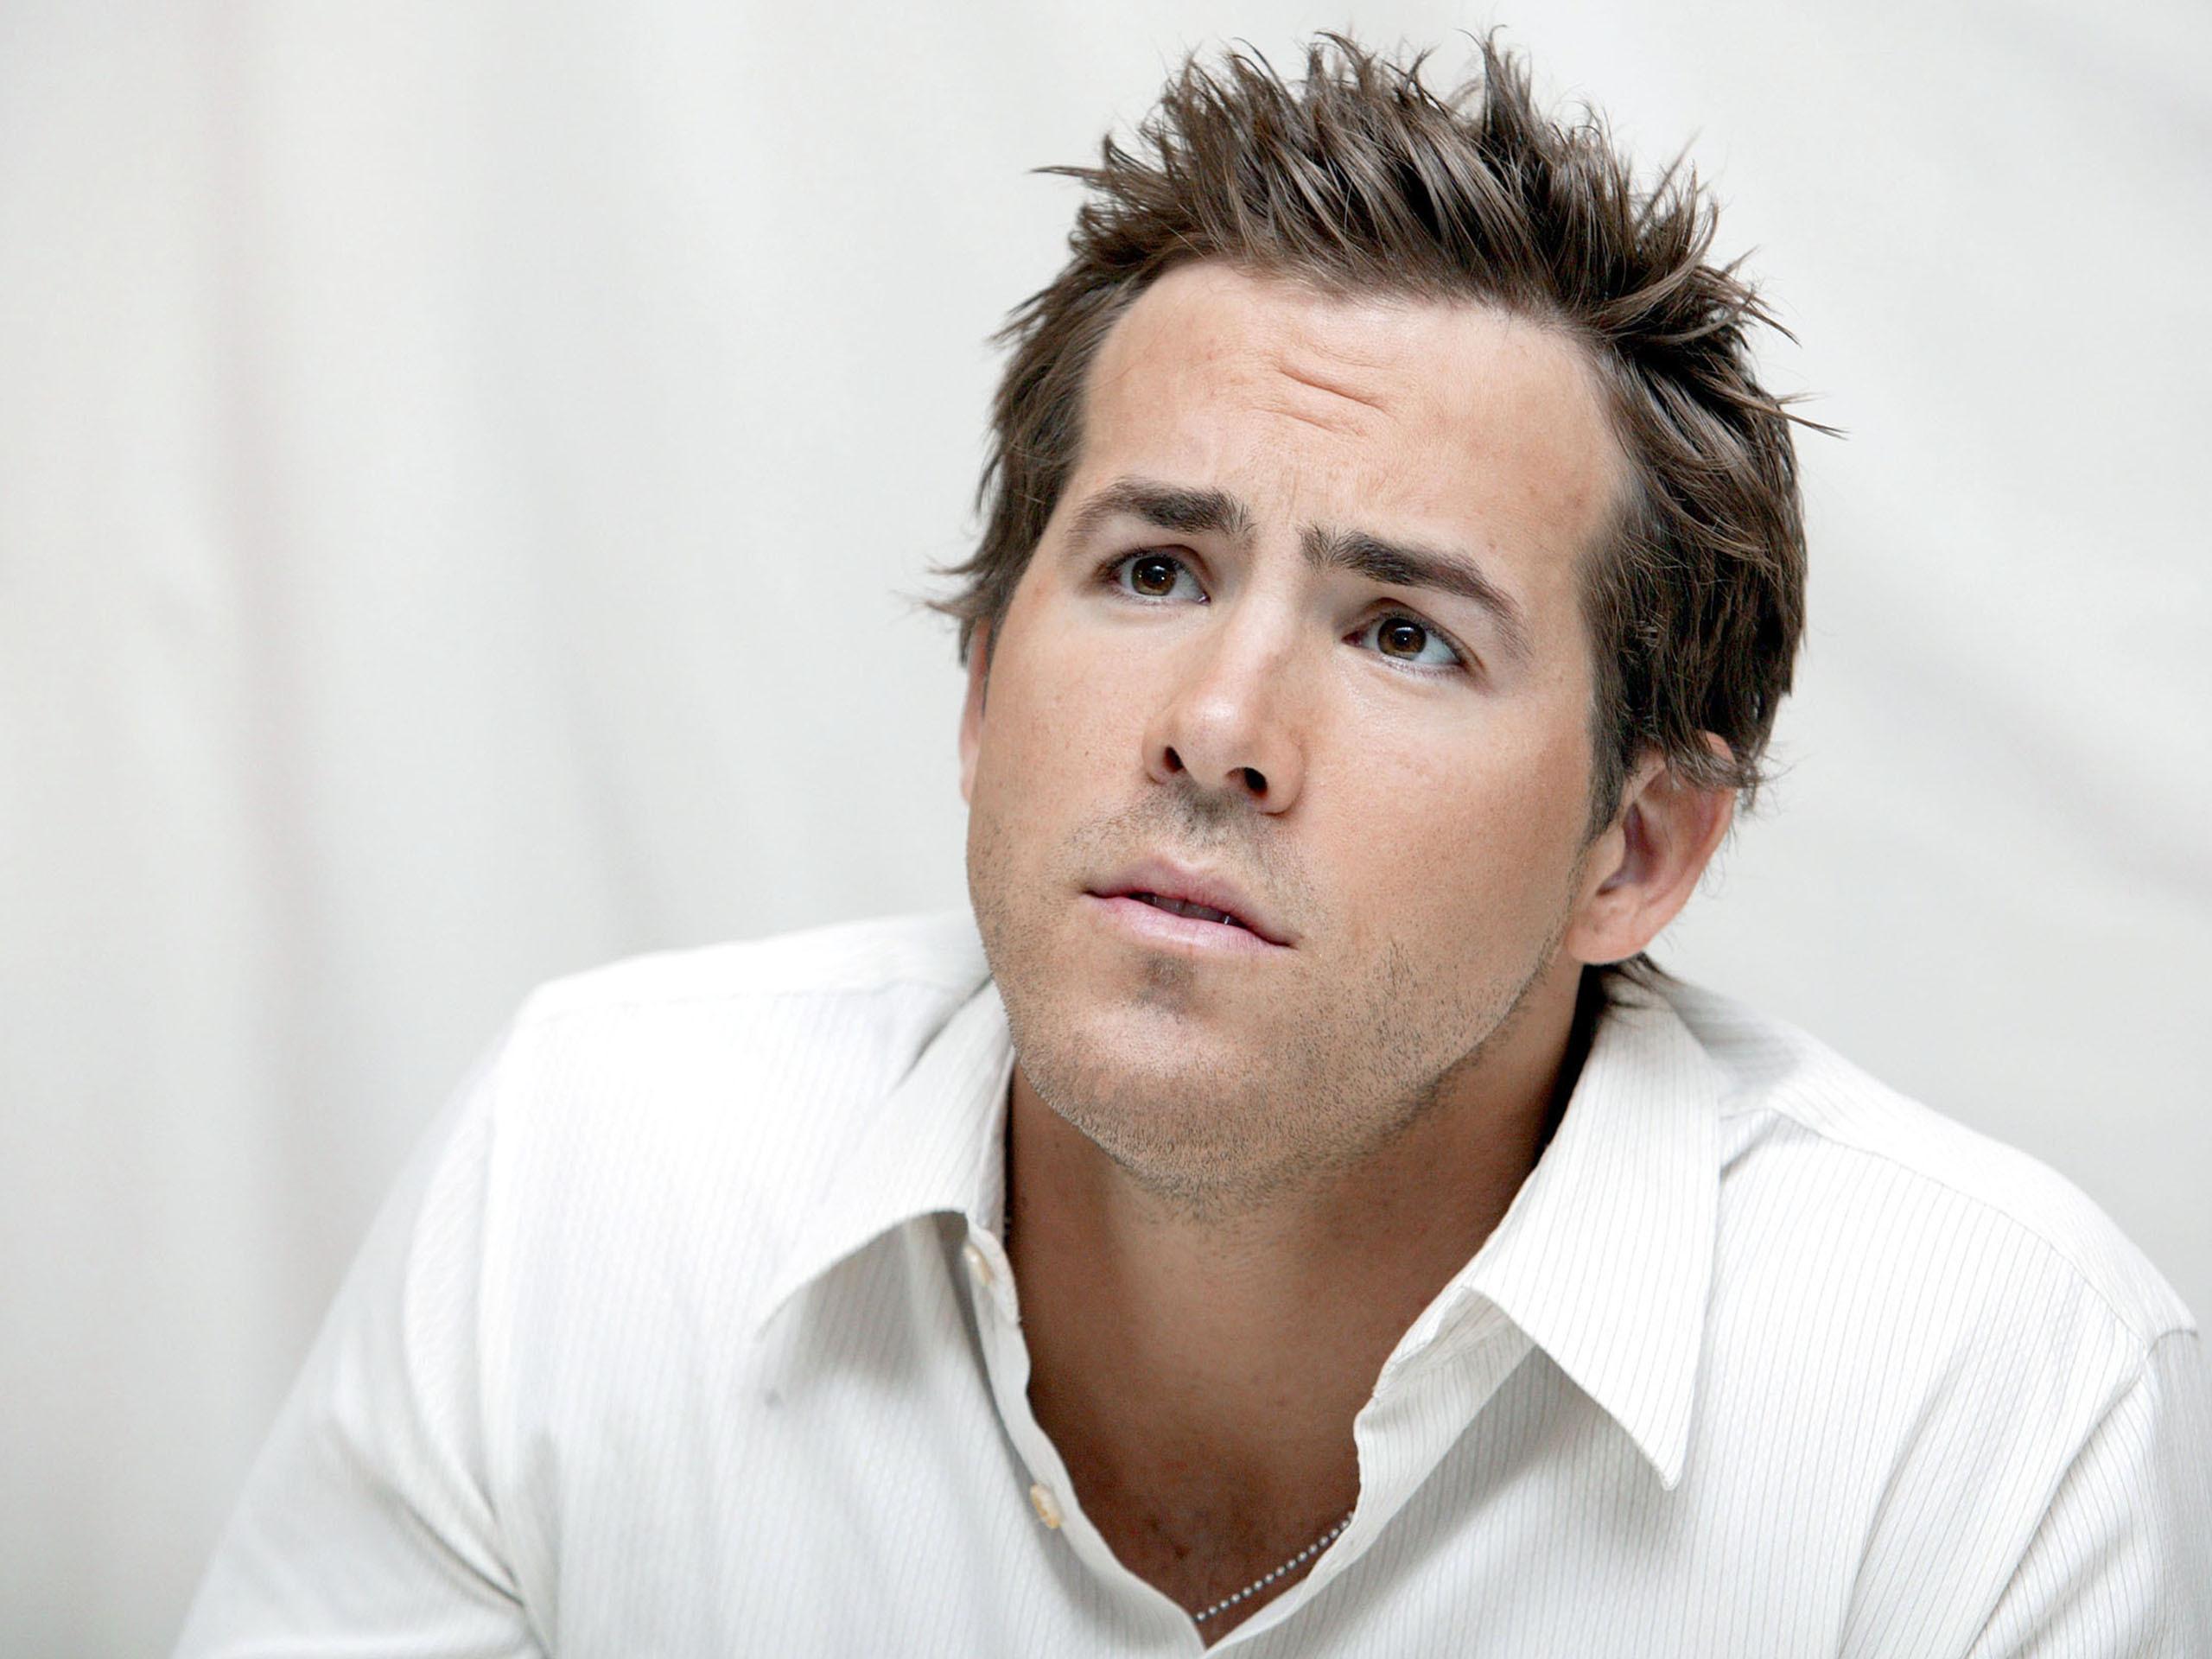 Ryan Reynolds Images